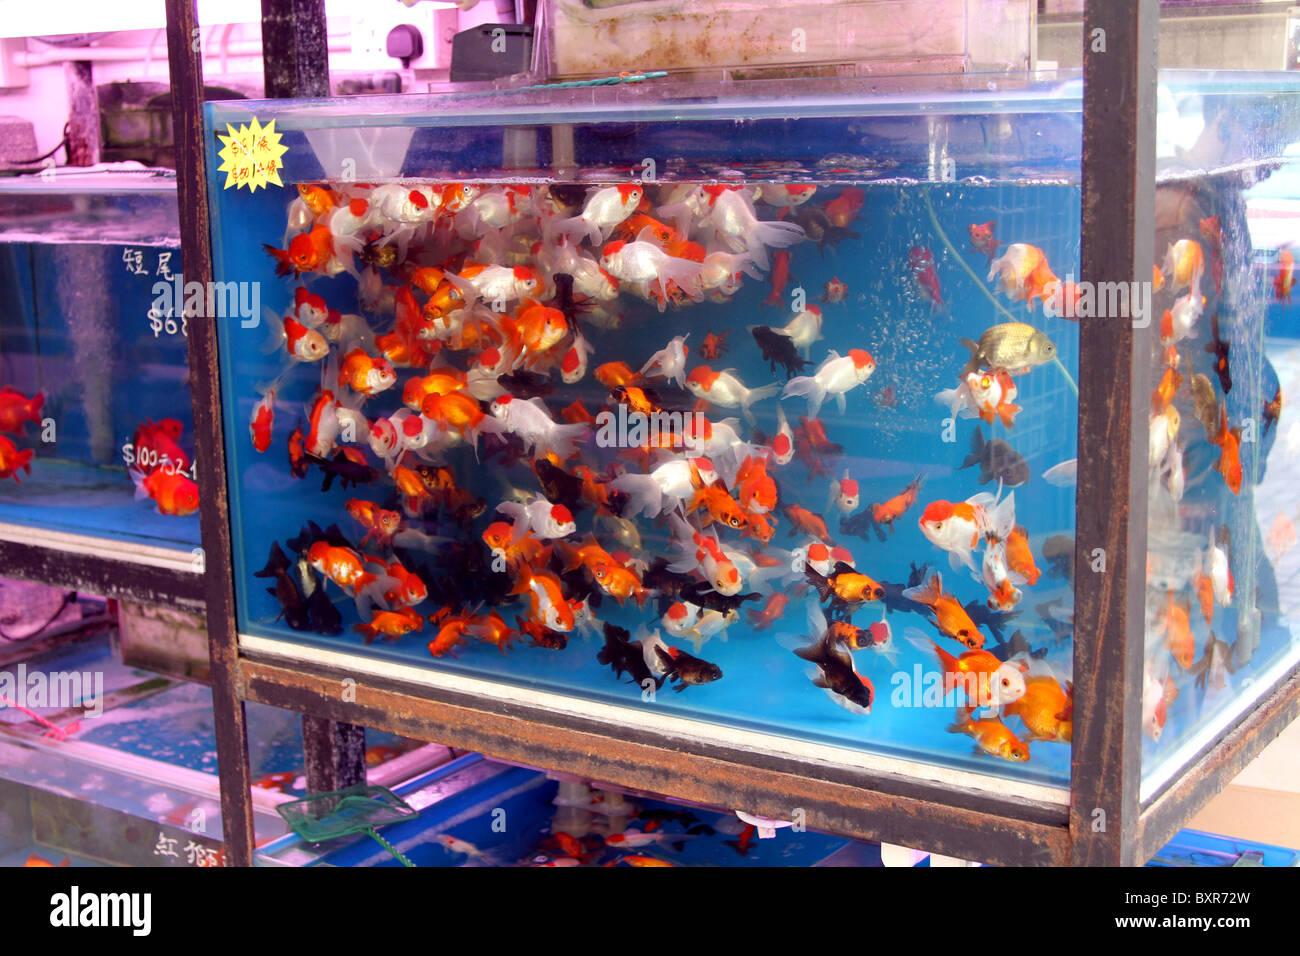 Aquarium zoohandlung verkaufen goldfische in plastikt ten for Aquarium goldfische